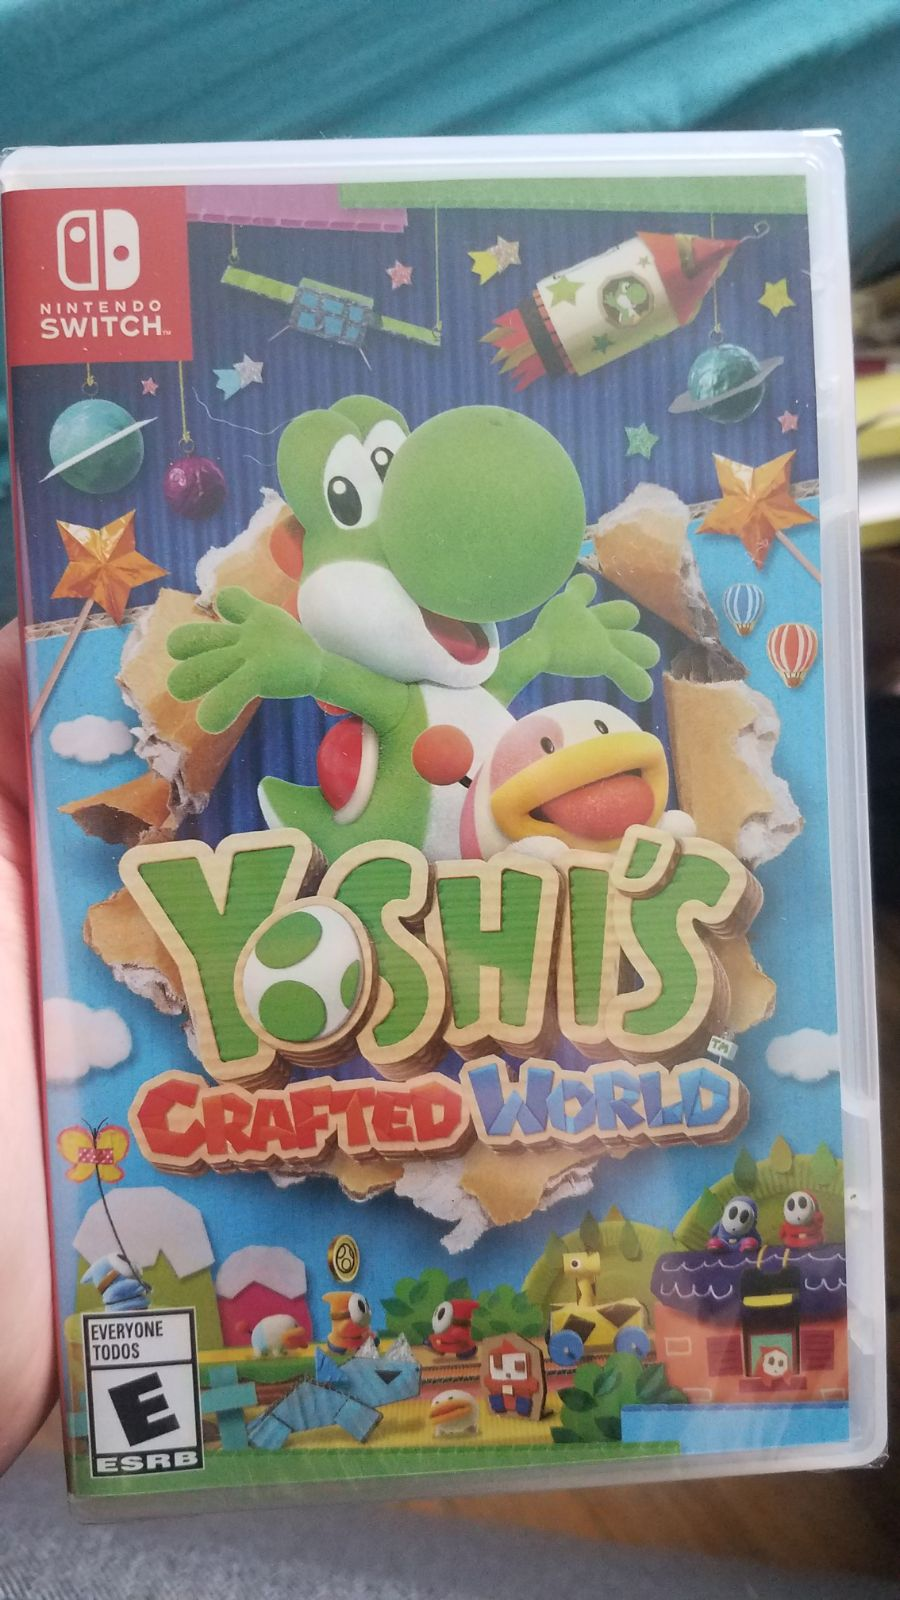 Yoshi's Crafted World on Nintendo Switch